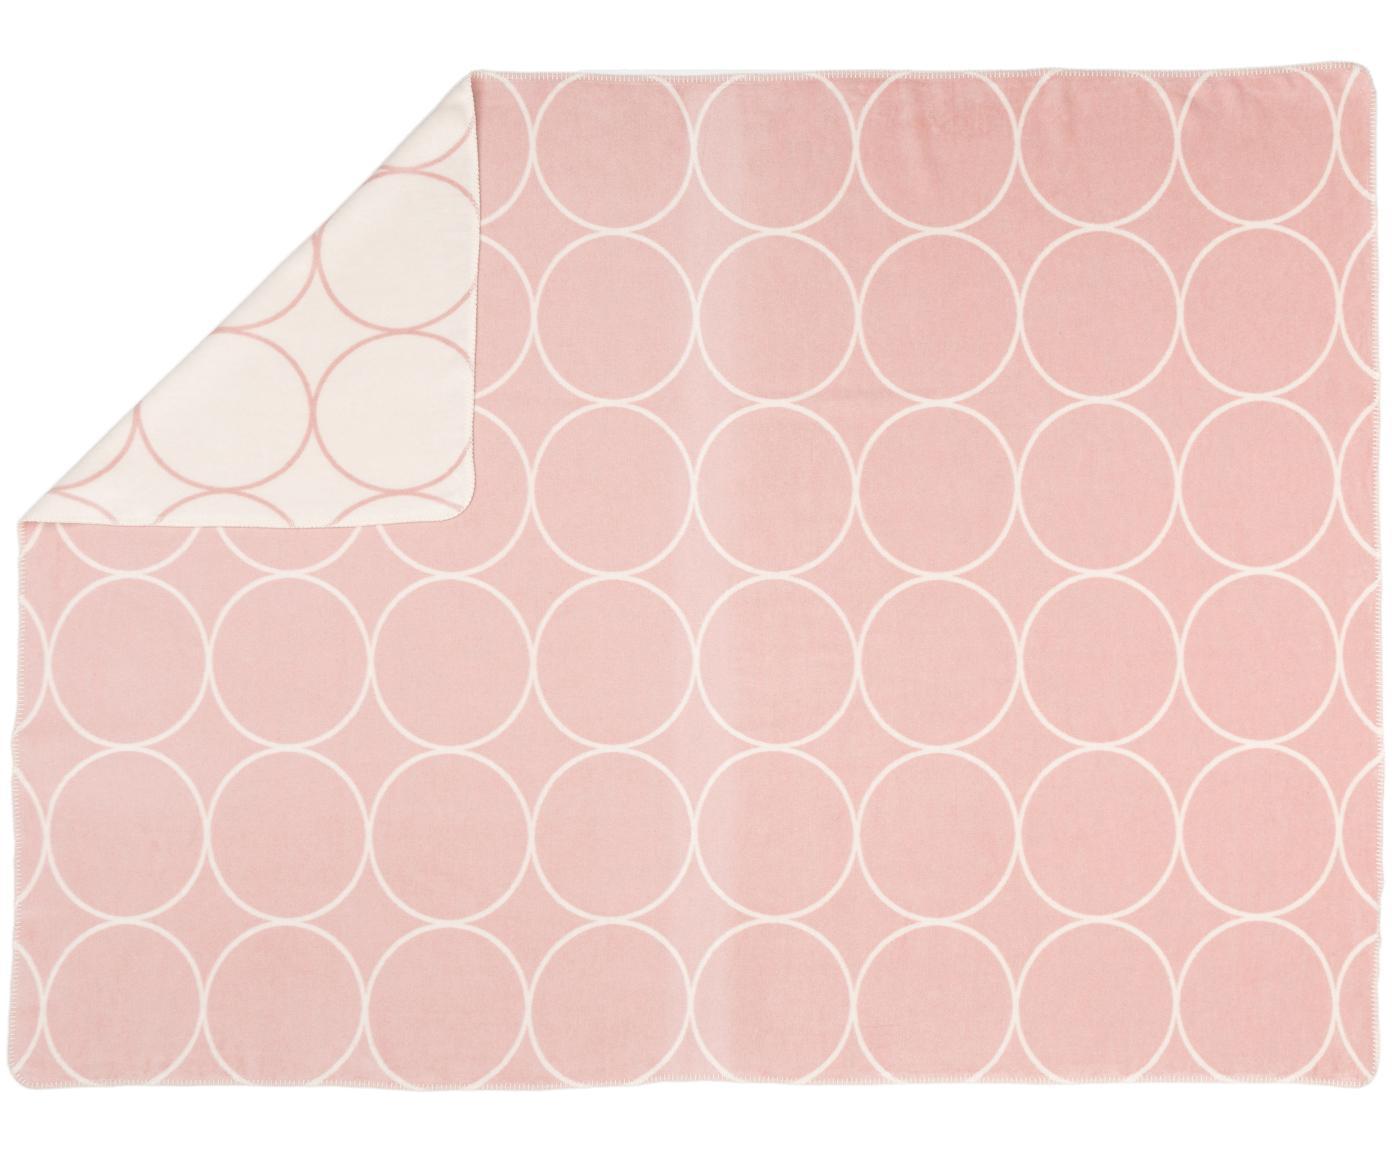 Velour-Wendeplaid Bamboo Circles, Webart: Jacquard, Altrosa, Weiß, 150 x 200 cm